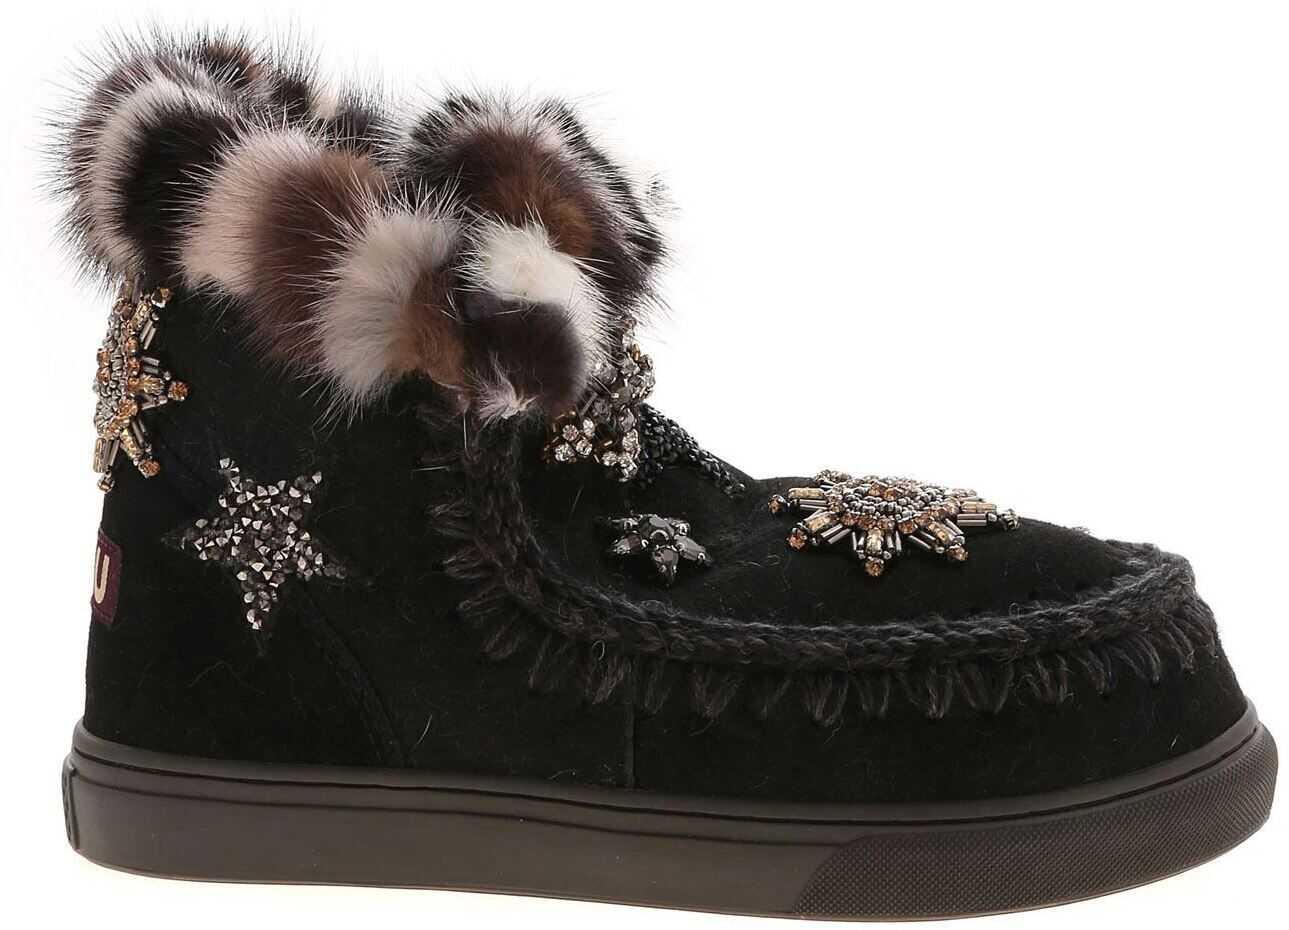 Mou Eskimo Star Patches And Mink Fur Sneakers In Black MU.FW111006A BKBK Black imagine b-mall.ro